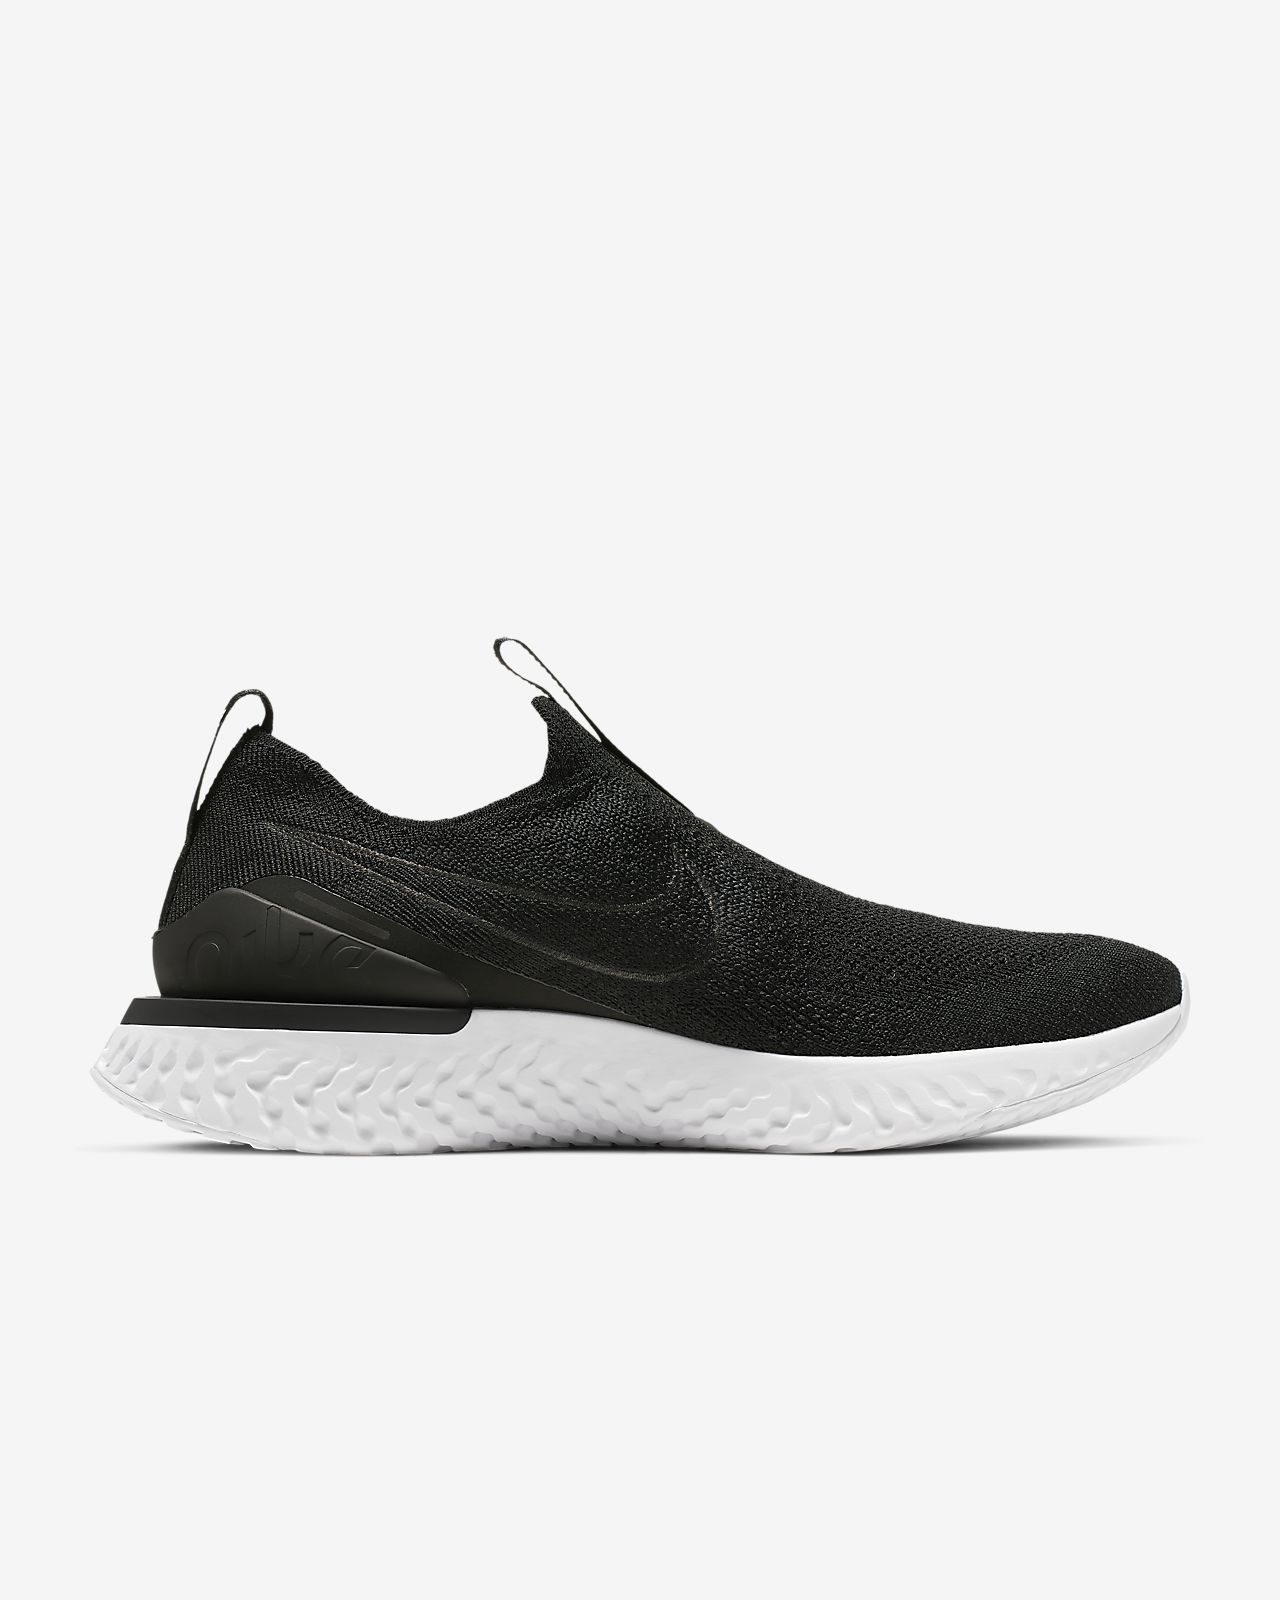 new style d0945 5cd1c ... Chaussure de running Nike Epic Phantom React Flyknit pour Femme